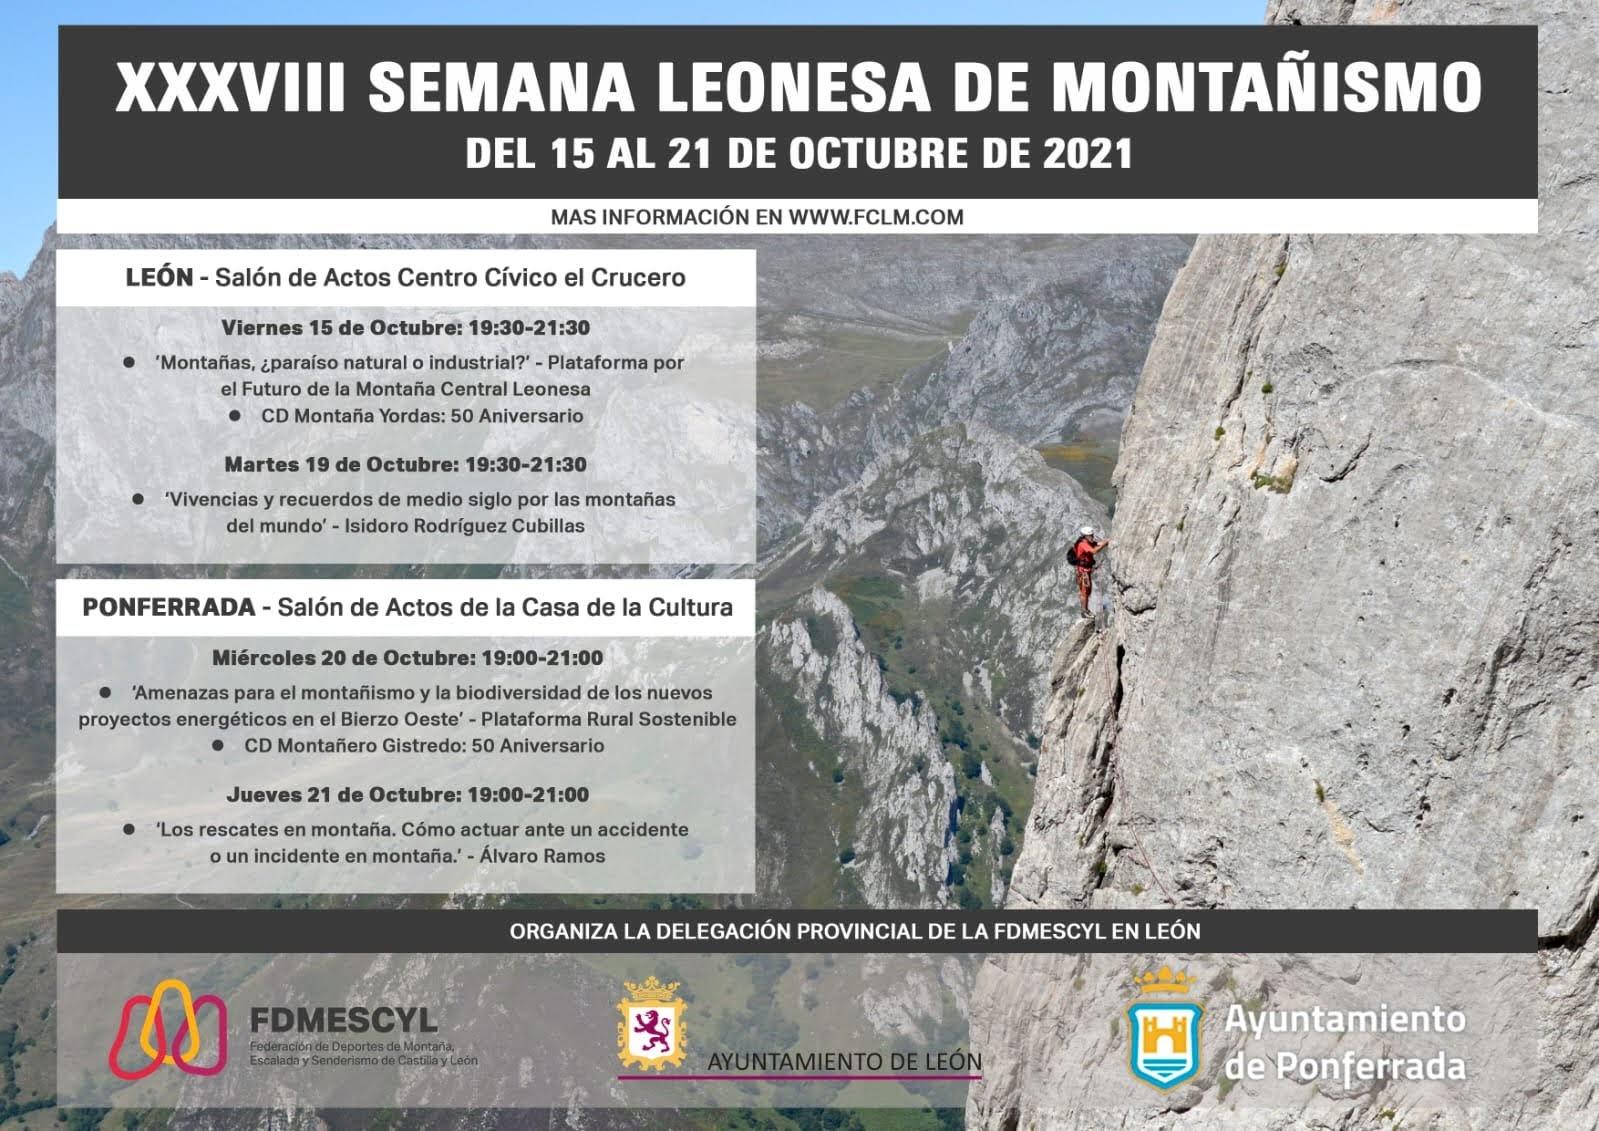 XXXVIII Semana Leonesa de Montañismo 2021 2